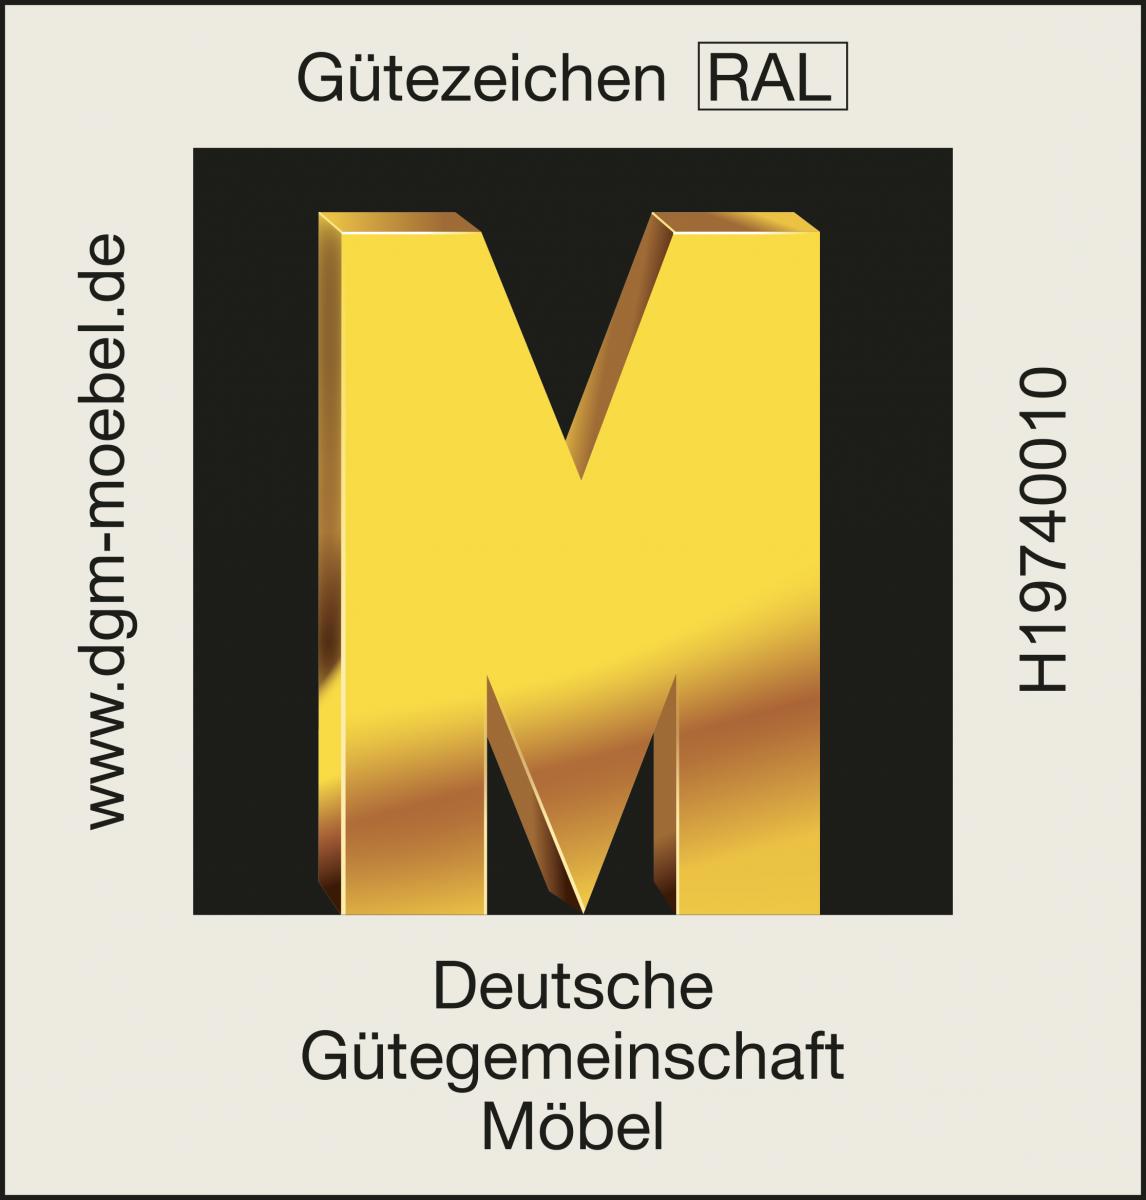 Wohndesign Nürnberg: Profil: GWINNER WOHNDESIGN GmbH